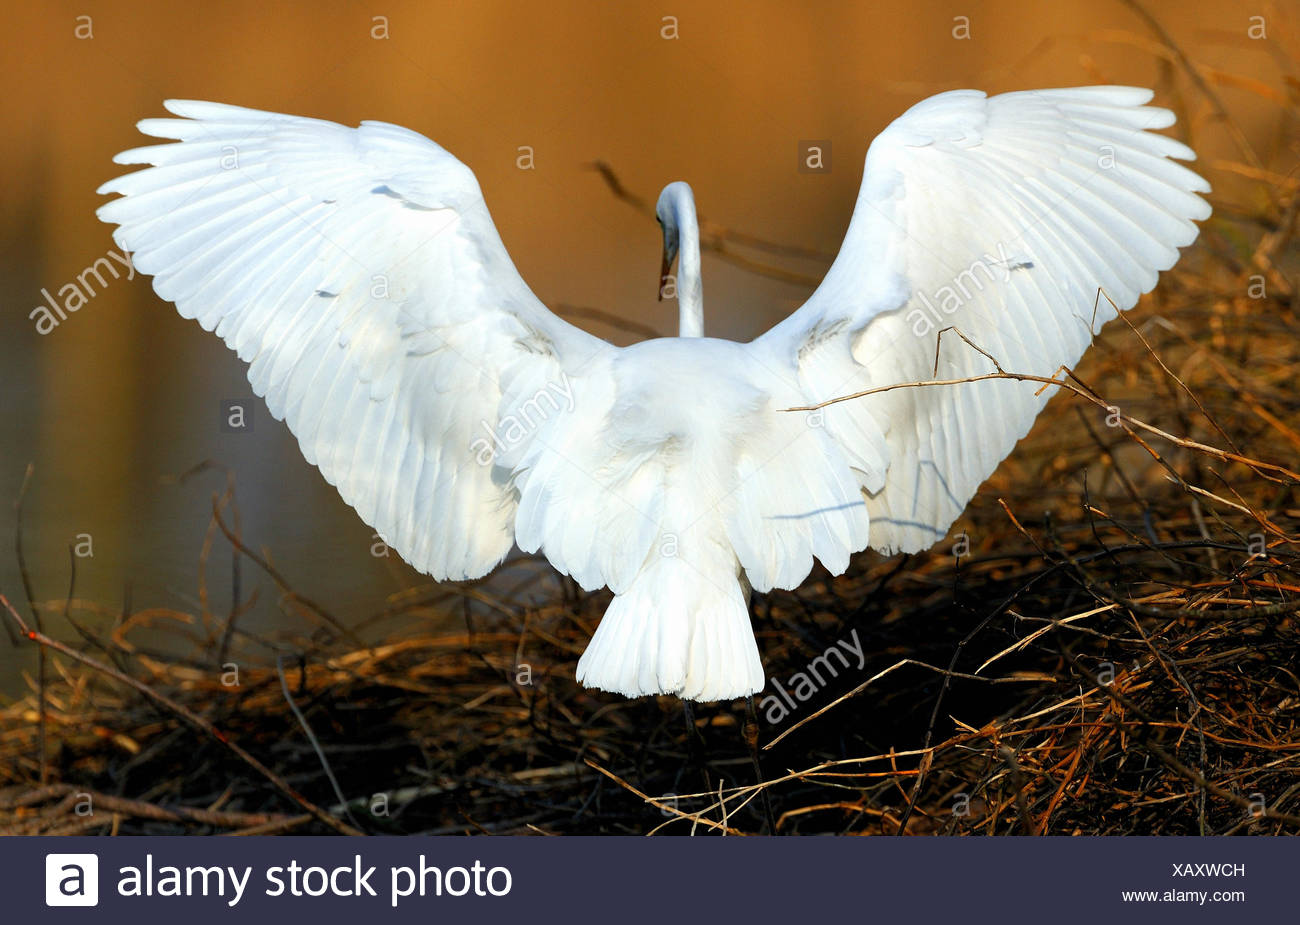 Garzetta Casmerodius Albus heron ciconiformi uccelli uccelli acquatici fly garzette beaver lodge Altmuehl lago di Franconia animale animali, Immagini Stock